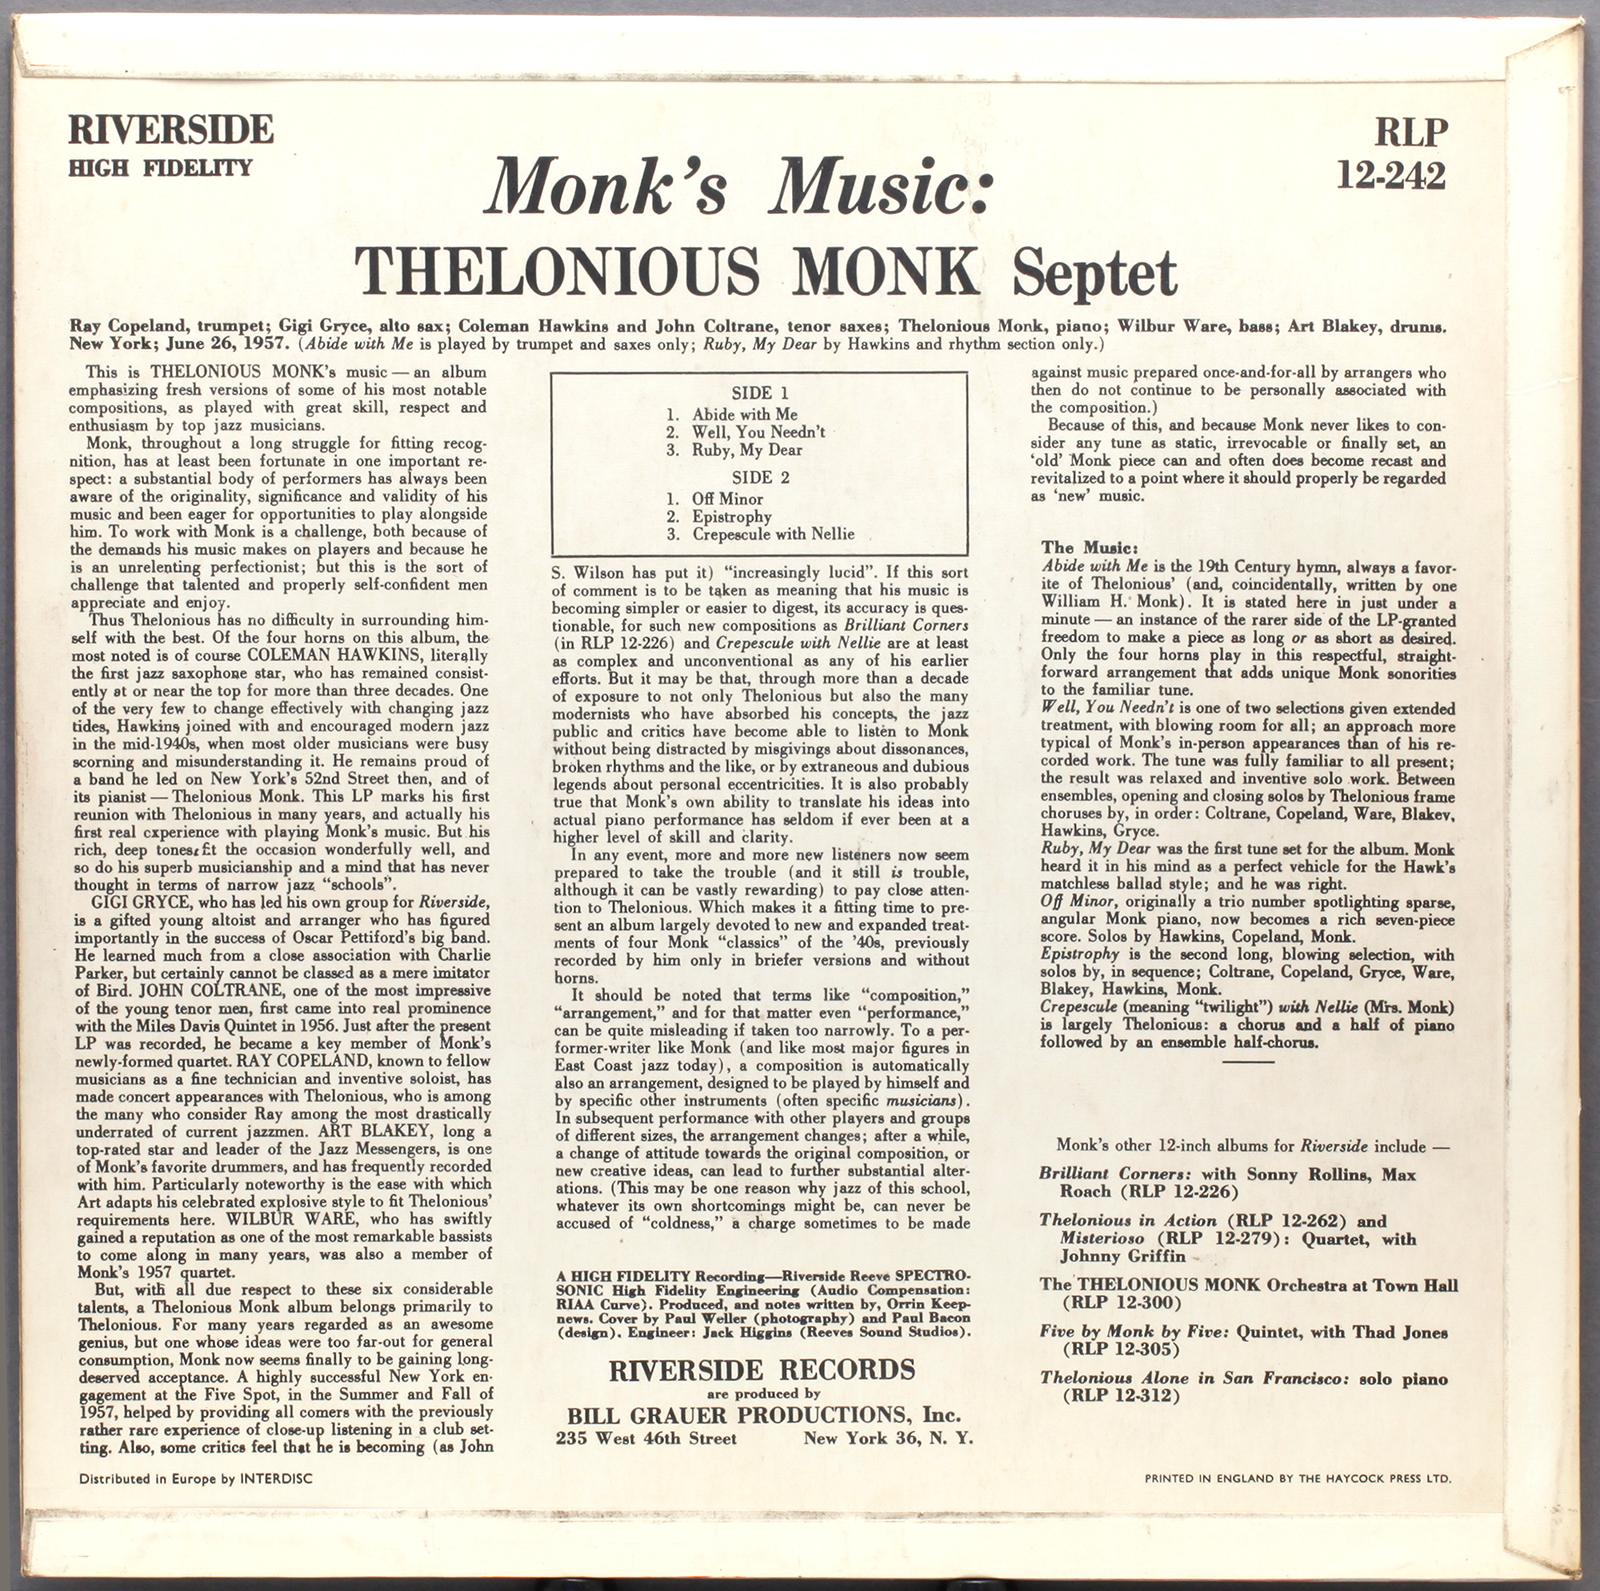 Thelonious Monk Quintet Thelonious Monk Quintet